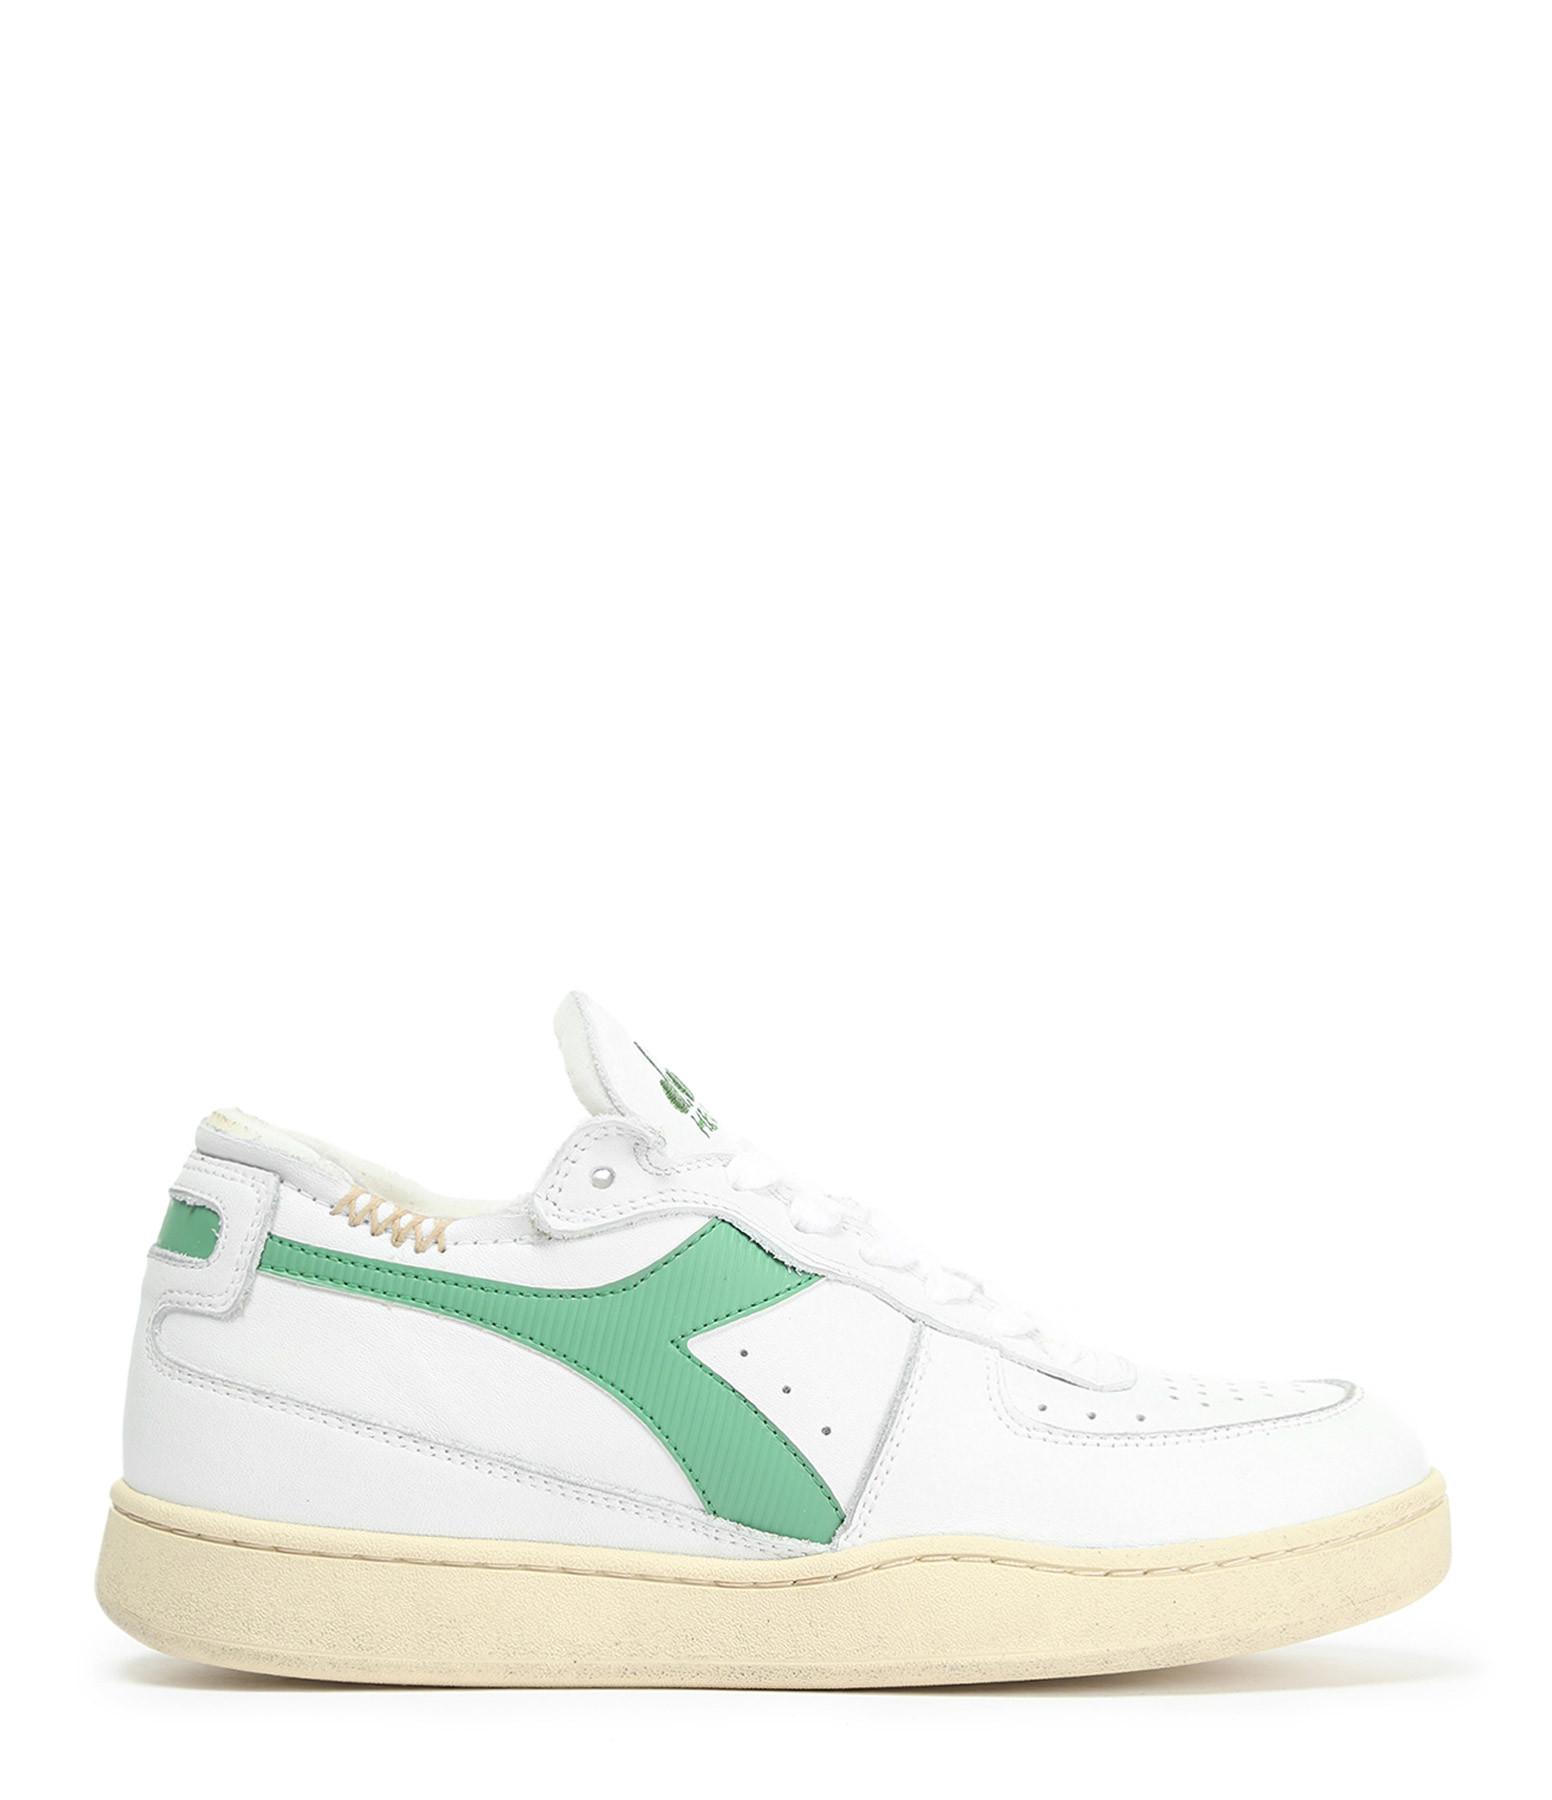 DIADORA - Baskets Mi Basket Row Cut Blanc Vert